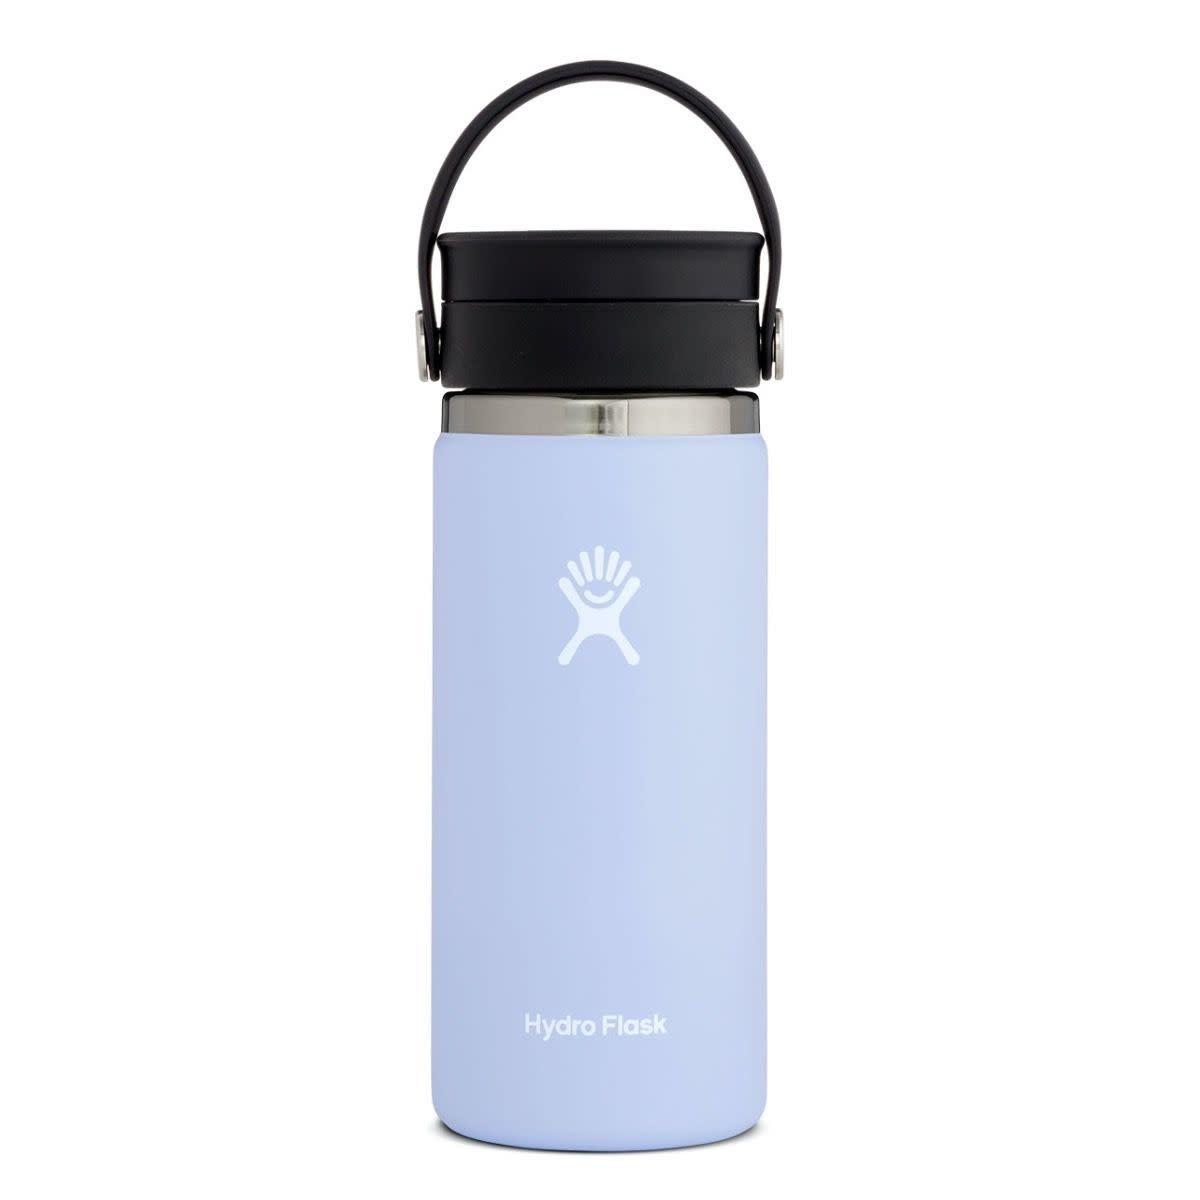 Hydroflask HF 16oz WIDE MOUTH w/ FLEX SIP